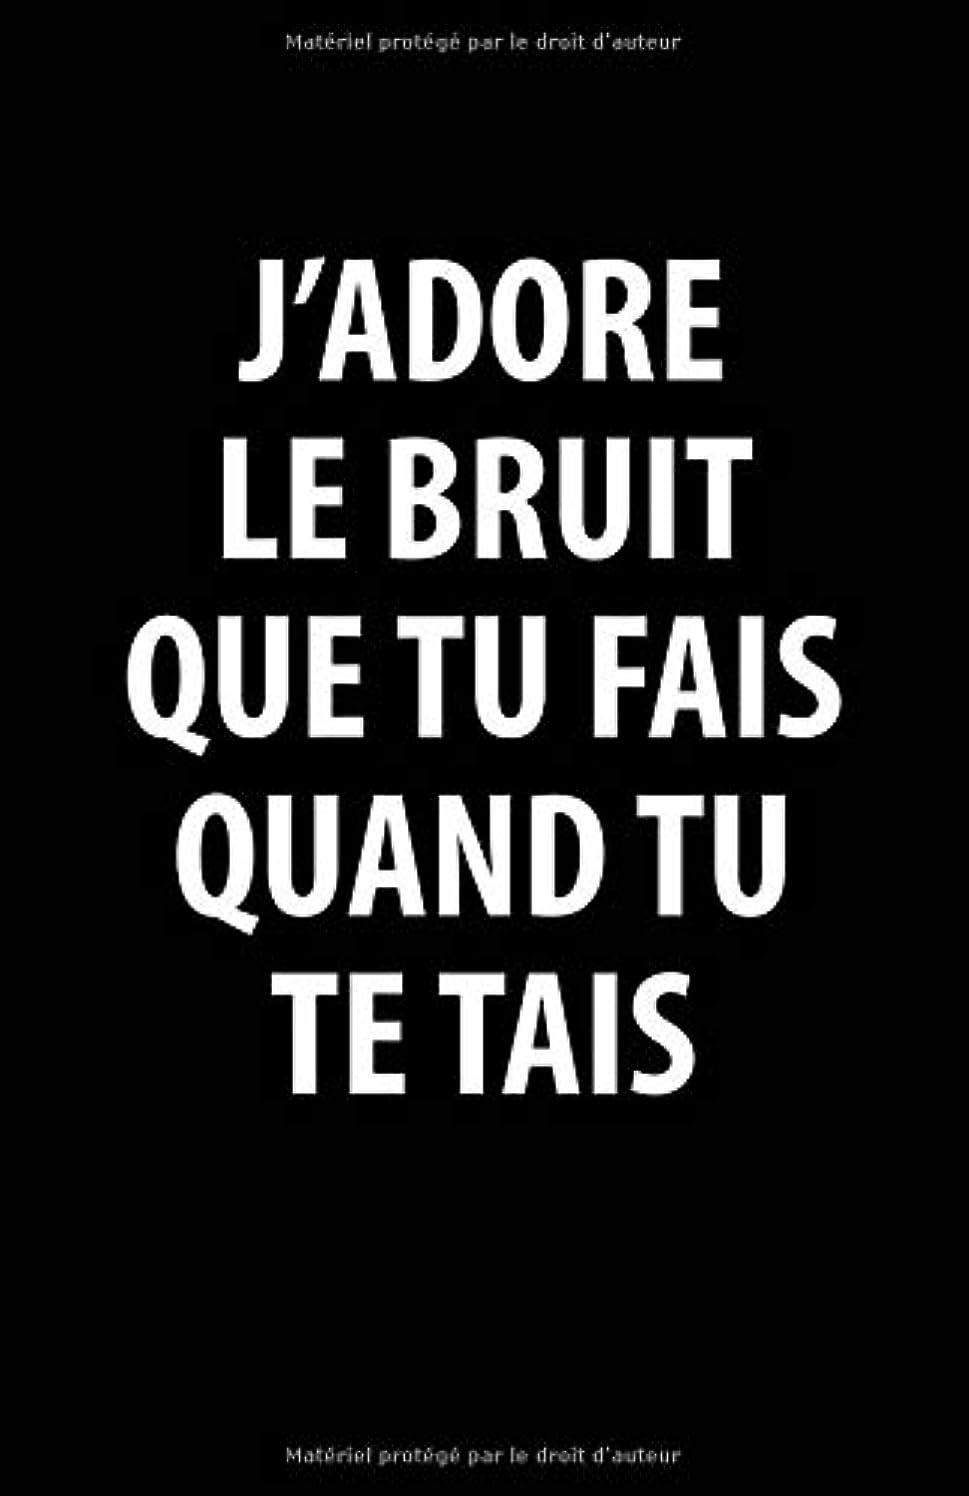 代数的威信フィードJ'adore Le Bruit Que Tu Fais Quand Tu Te Tais: Carnet De Notes -108 Pages Avec Papier Ligné Petit Format A5 -Couverture Souple - Blanc Sur Noir (Petite ligne d'écriture brouillon)